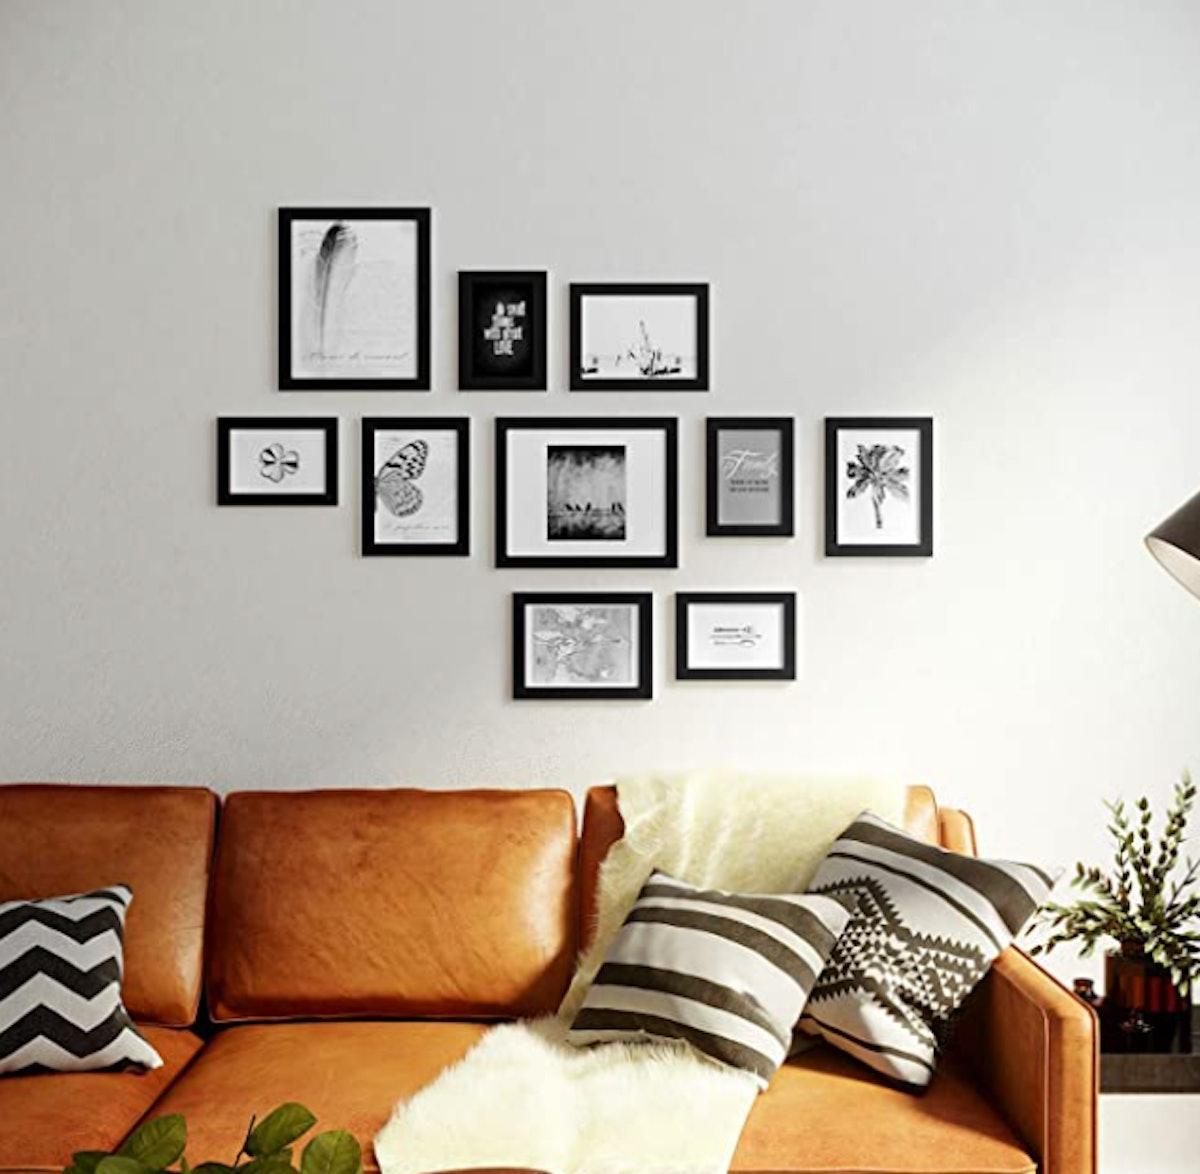 SONGMICS Picture Frames (10-Piece)